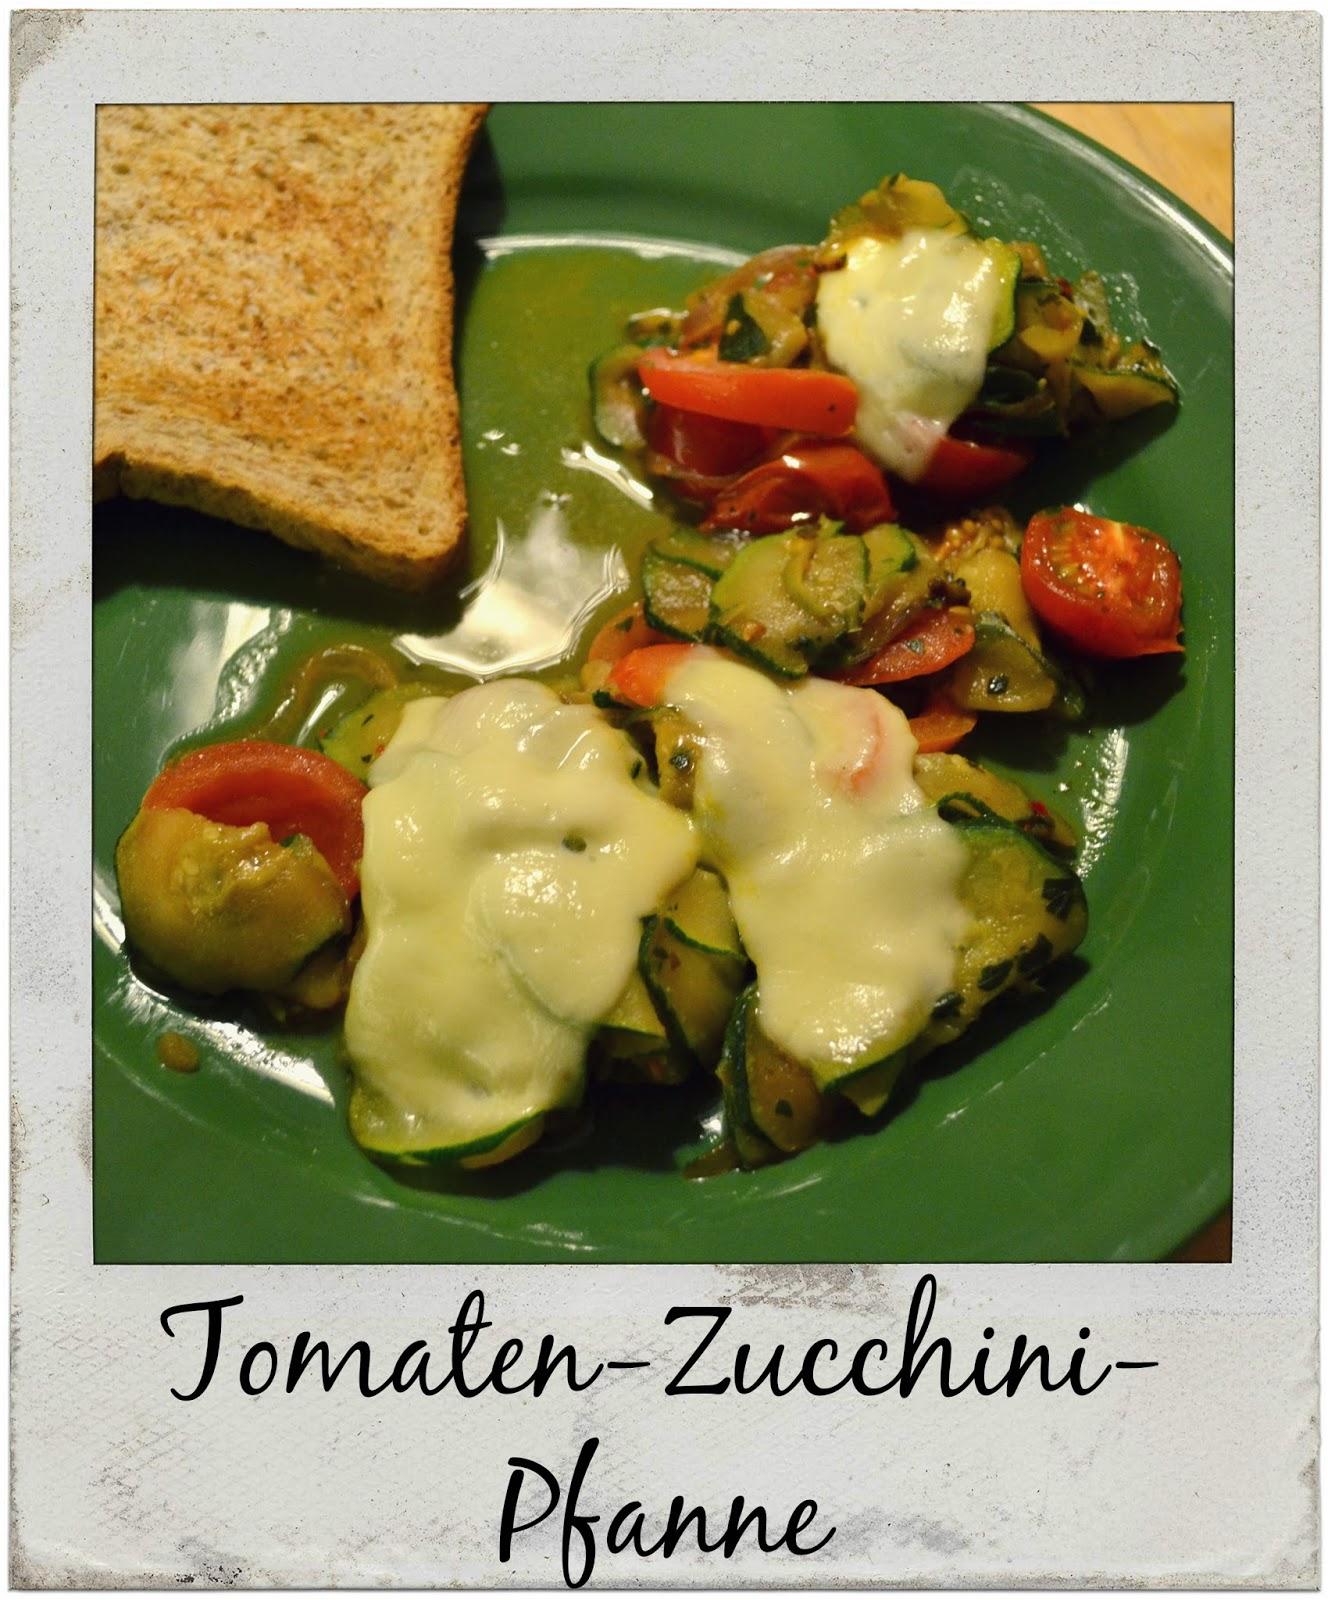 http://gemachtesundgedachtes.blogspot.de/2014/01/leckergekocht-tomaten-zucchini-pfanne.html